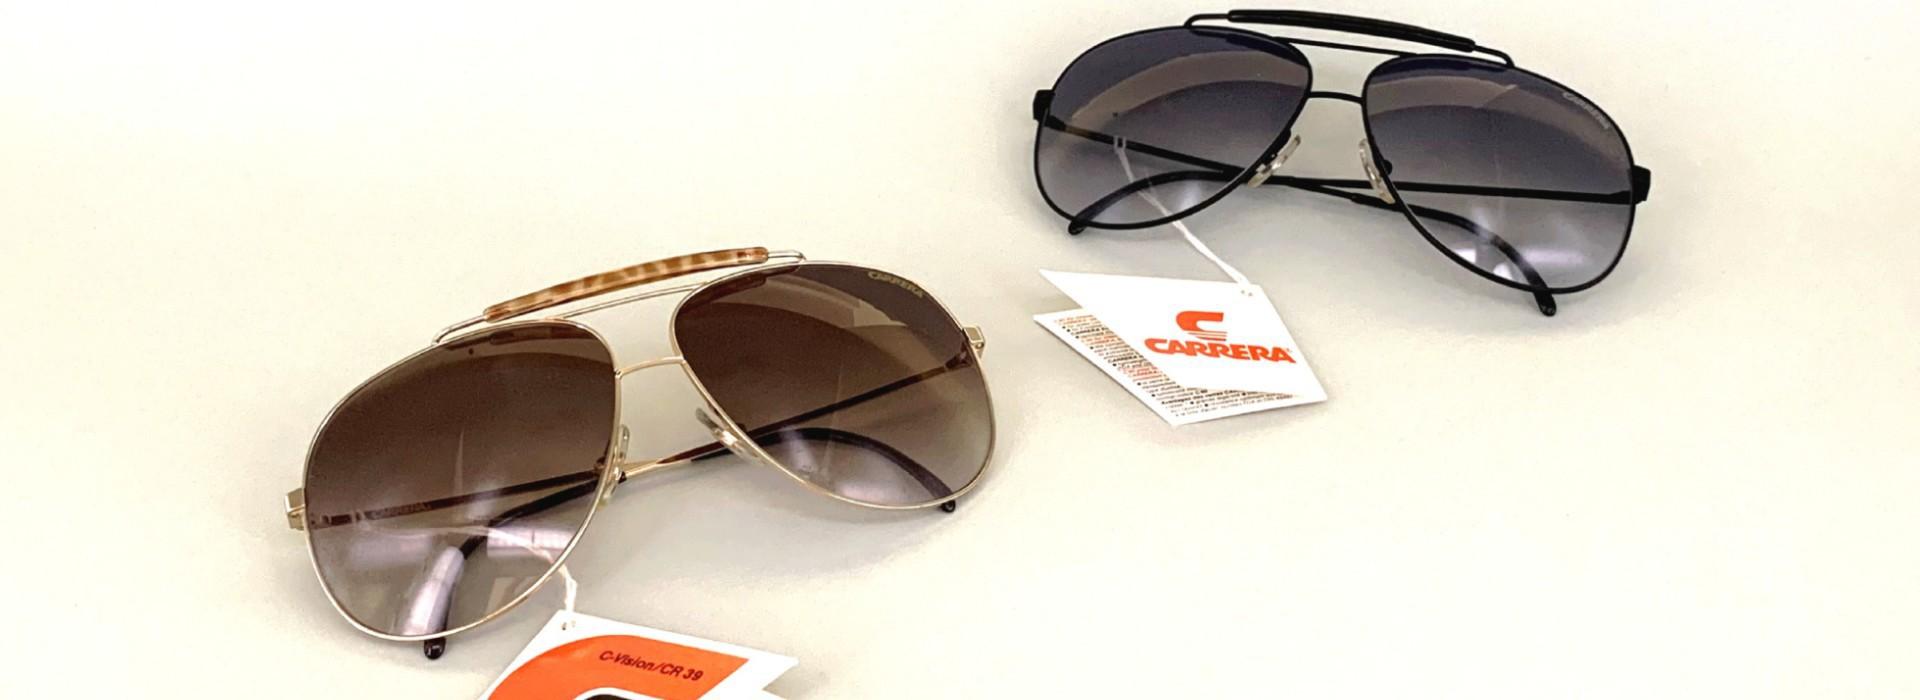 Carrera Sunglasses | Vintage Carrera sunglasses